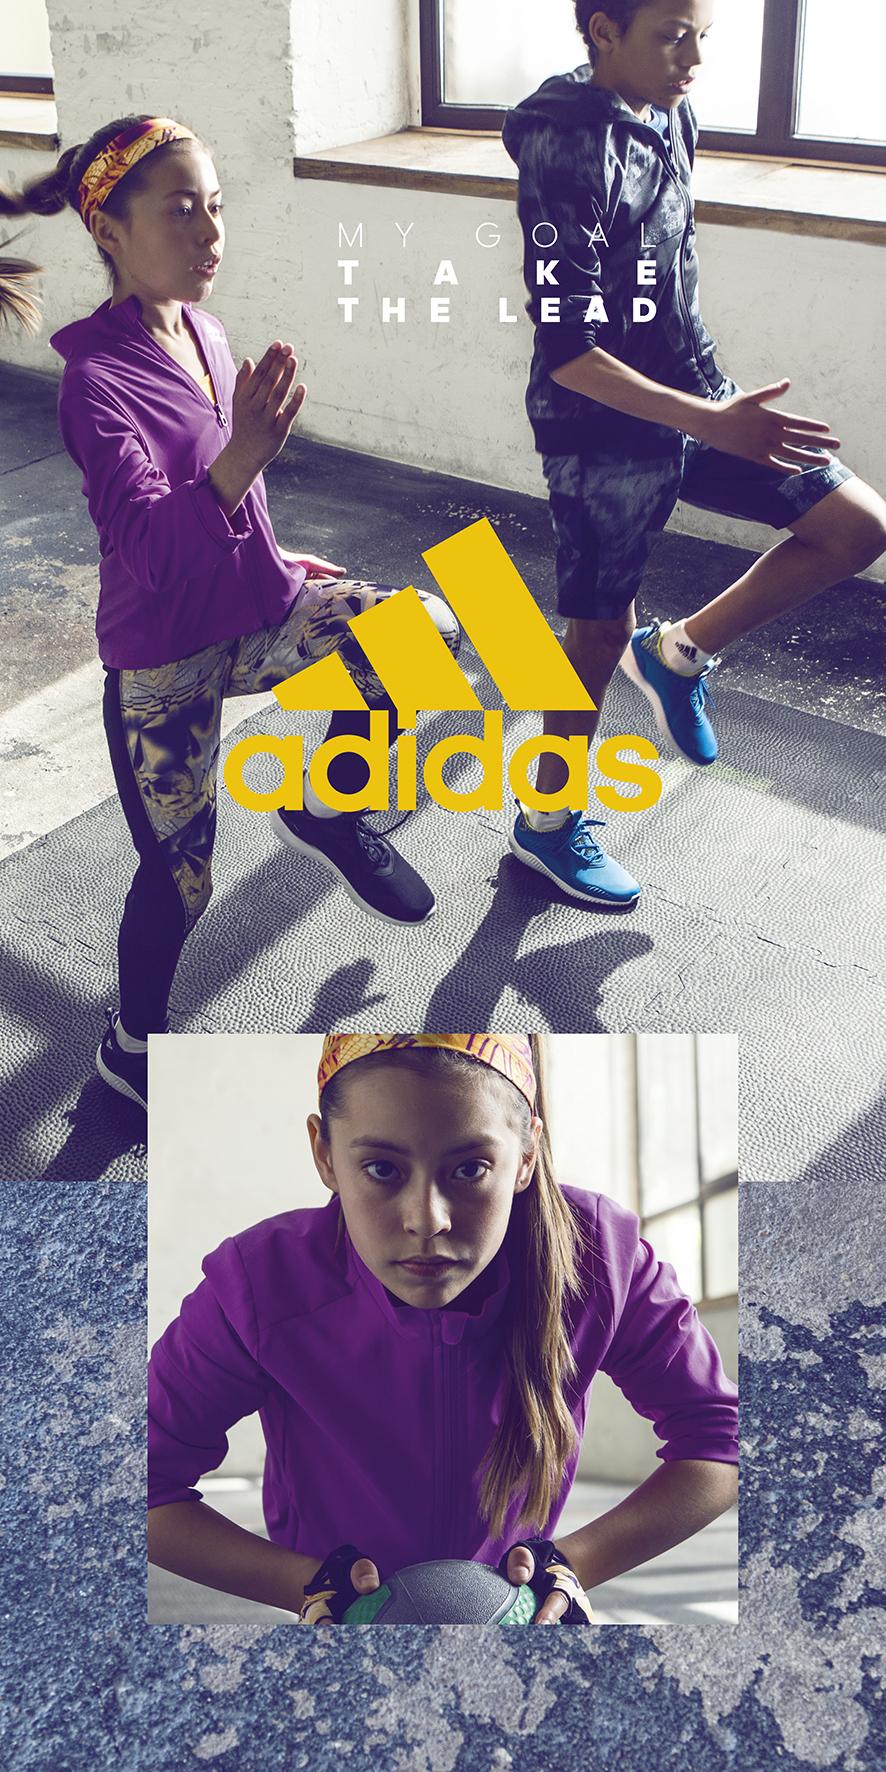 adidas_YoungAthletes_FW16_BacktoSport_1000x2000.jpg